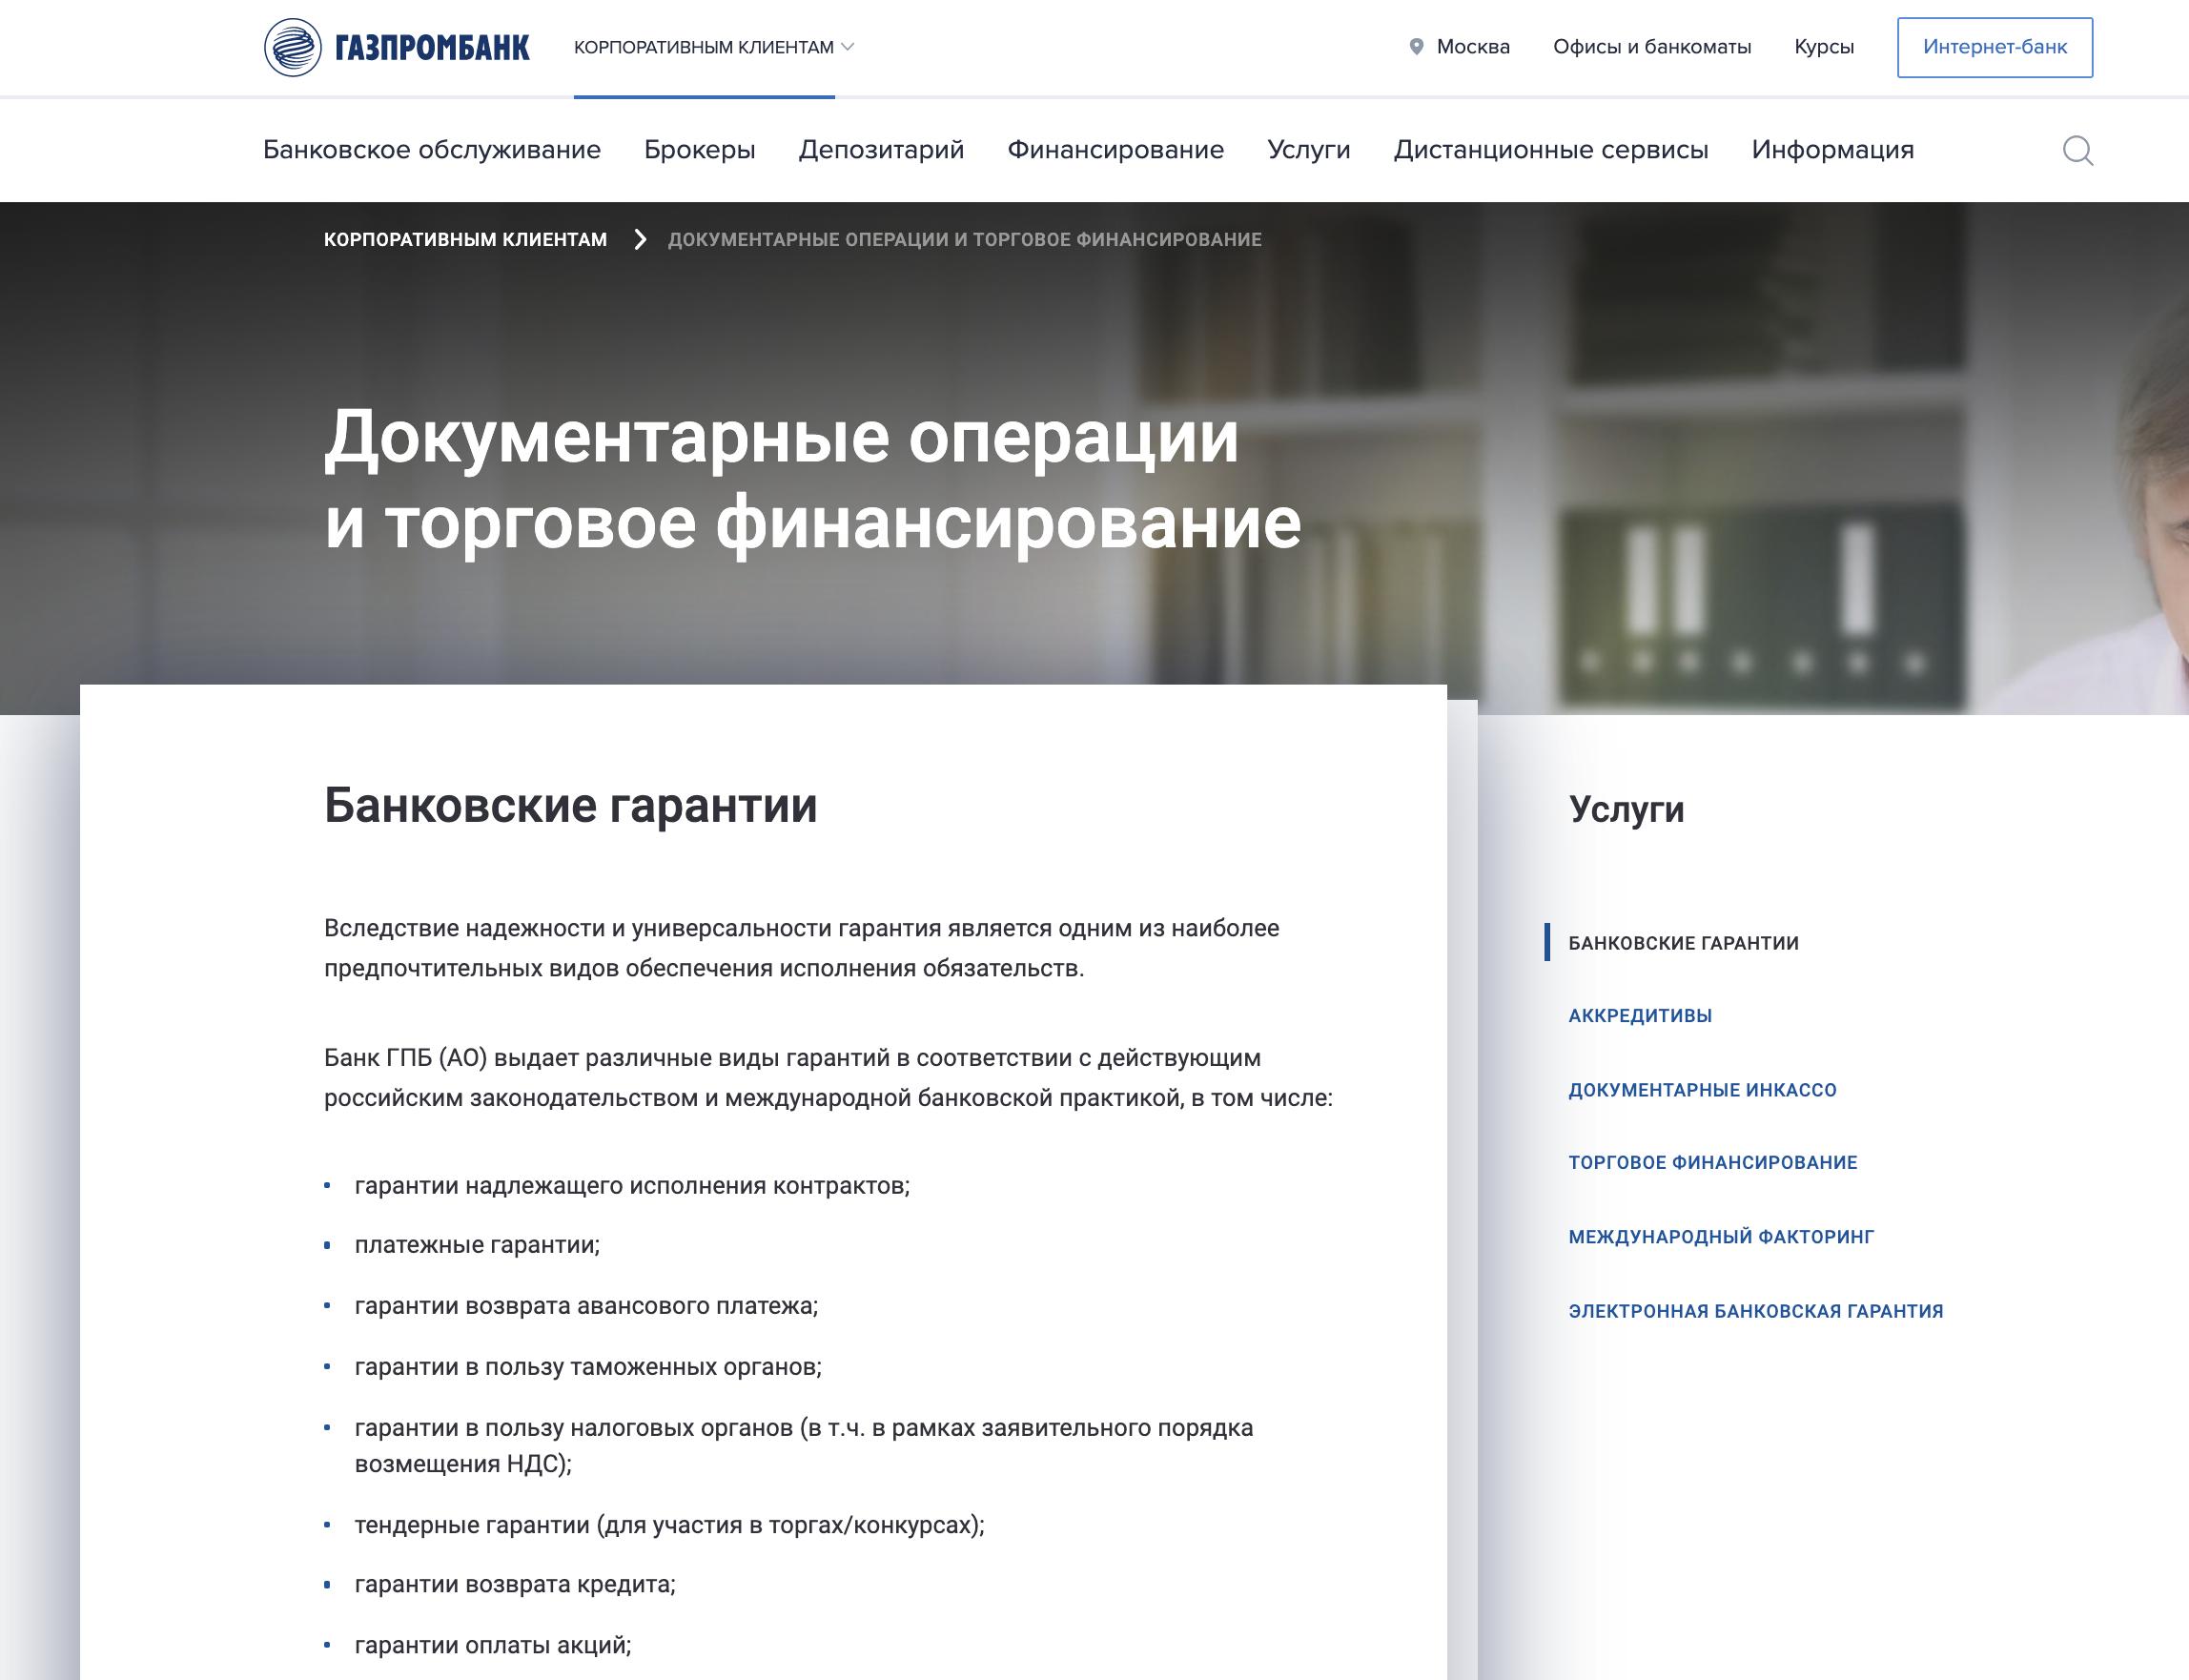 банковских гарантий в Газпромбанке